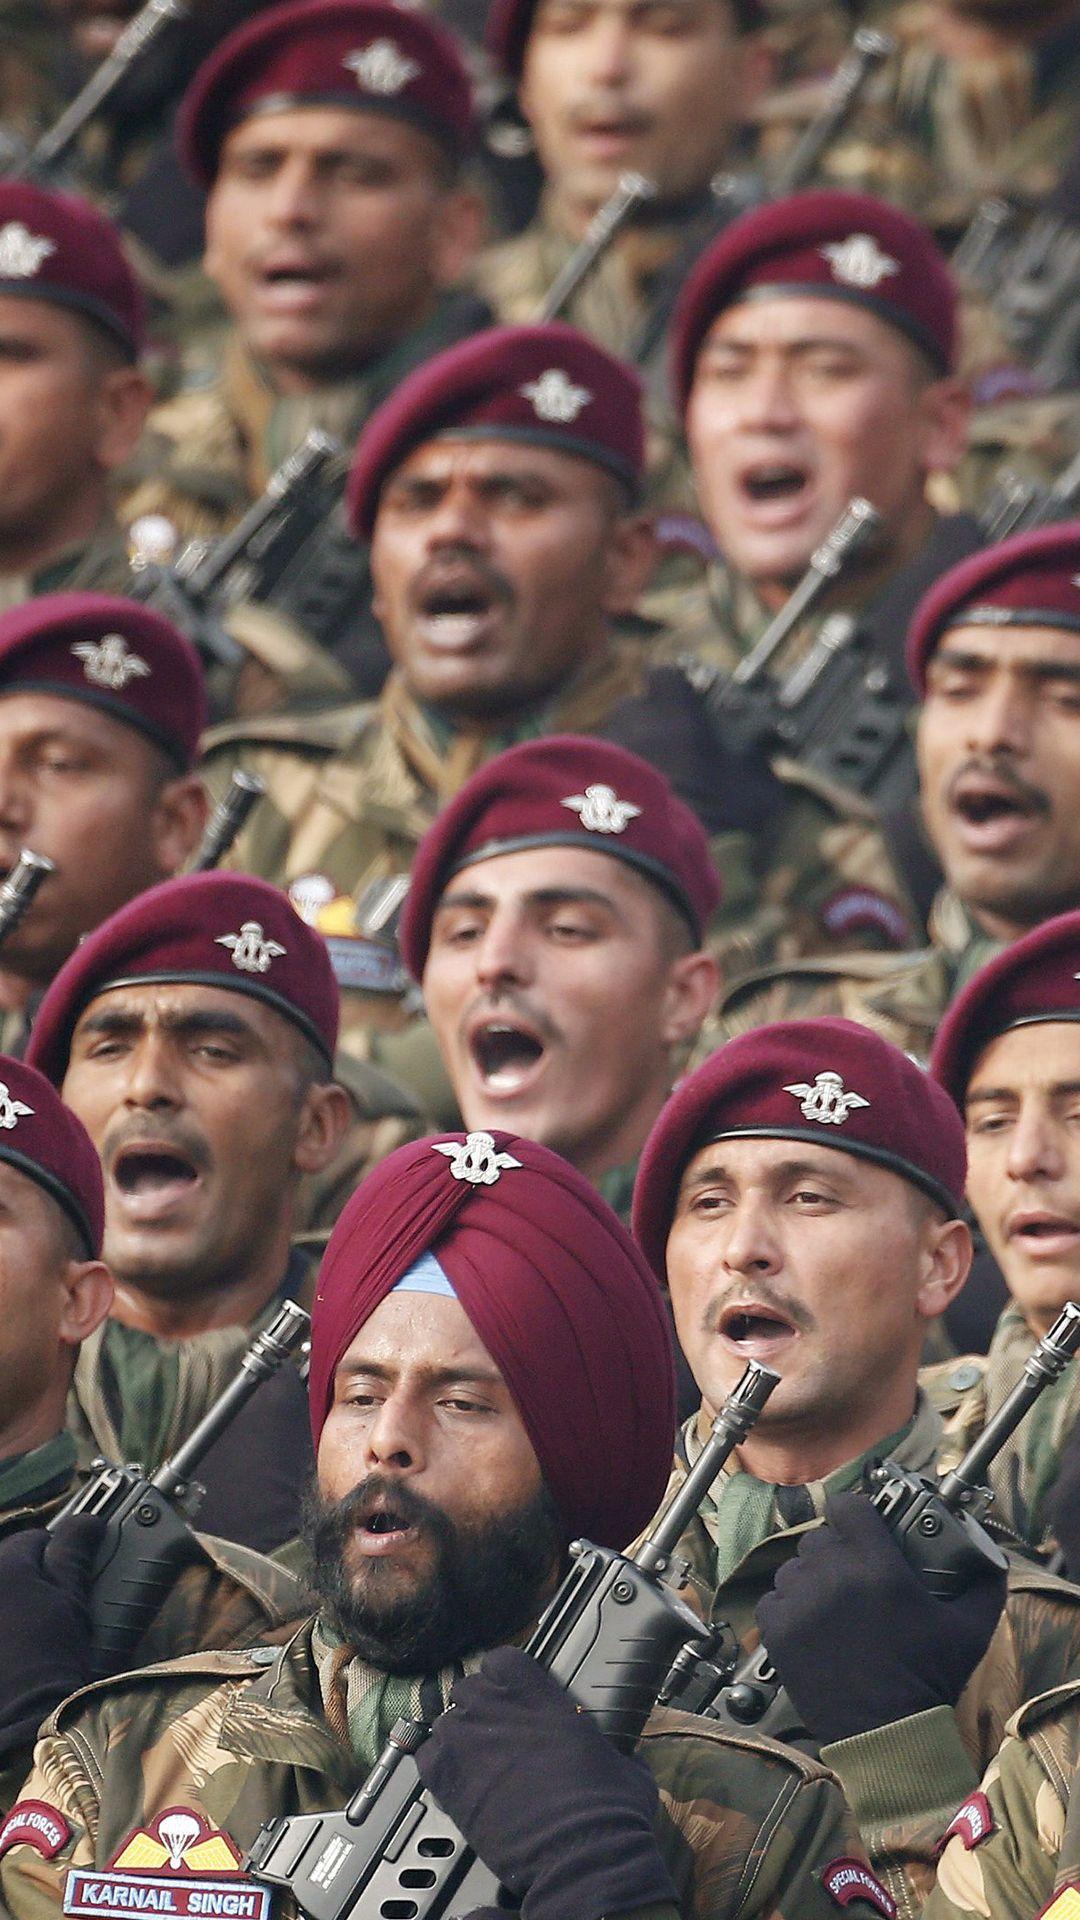 Para Special Forces (Para Commando) Indian Army